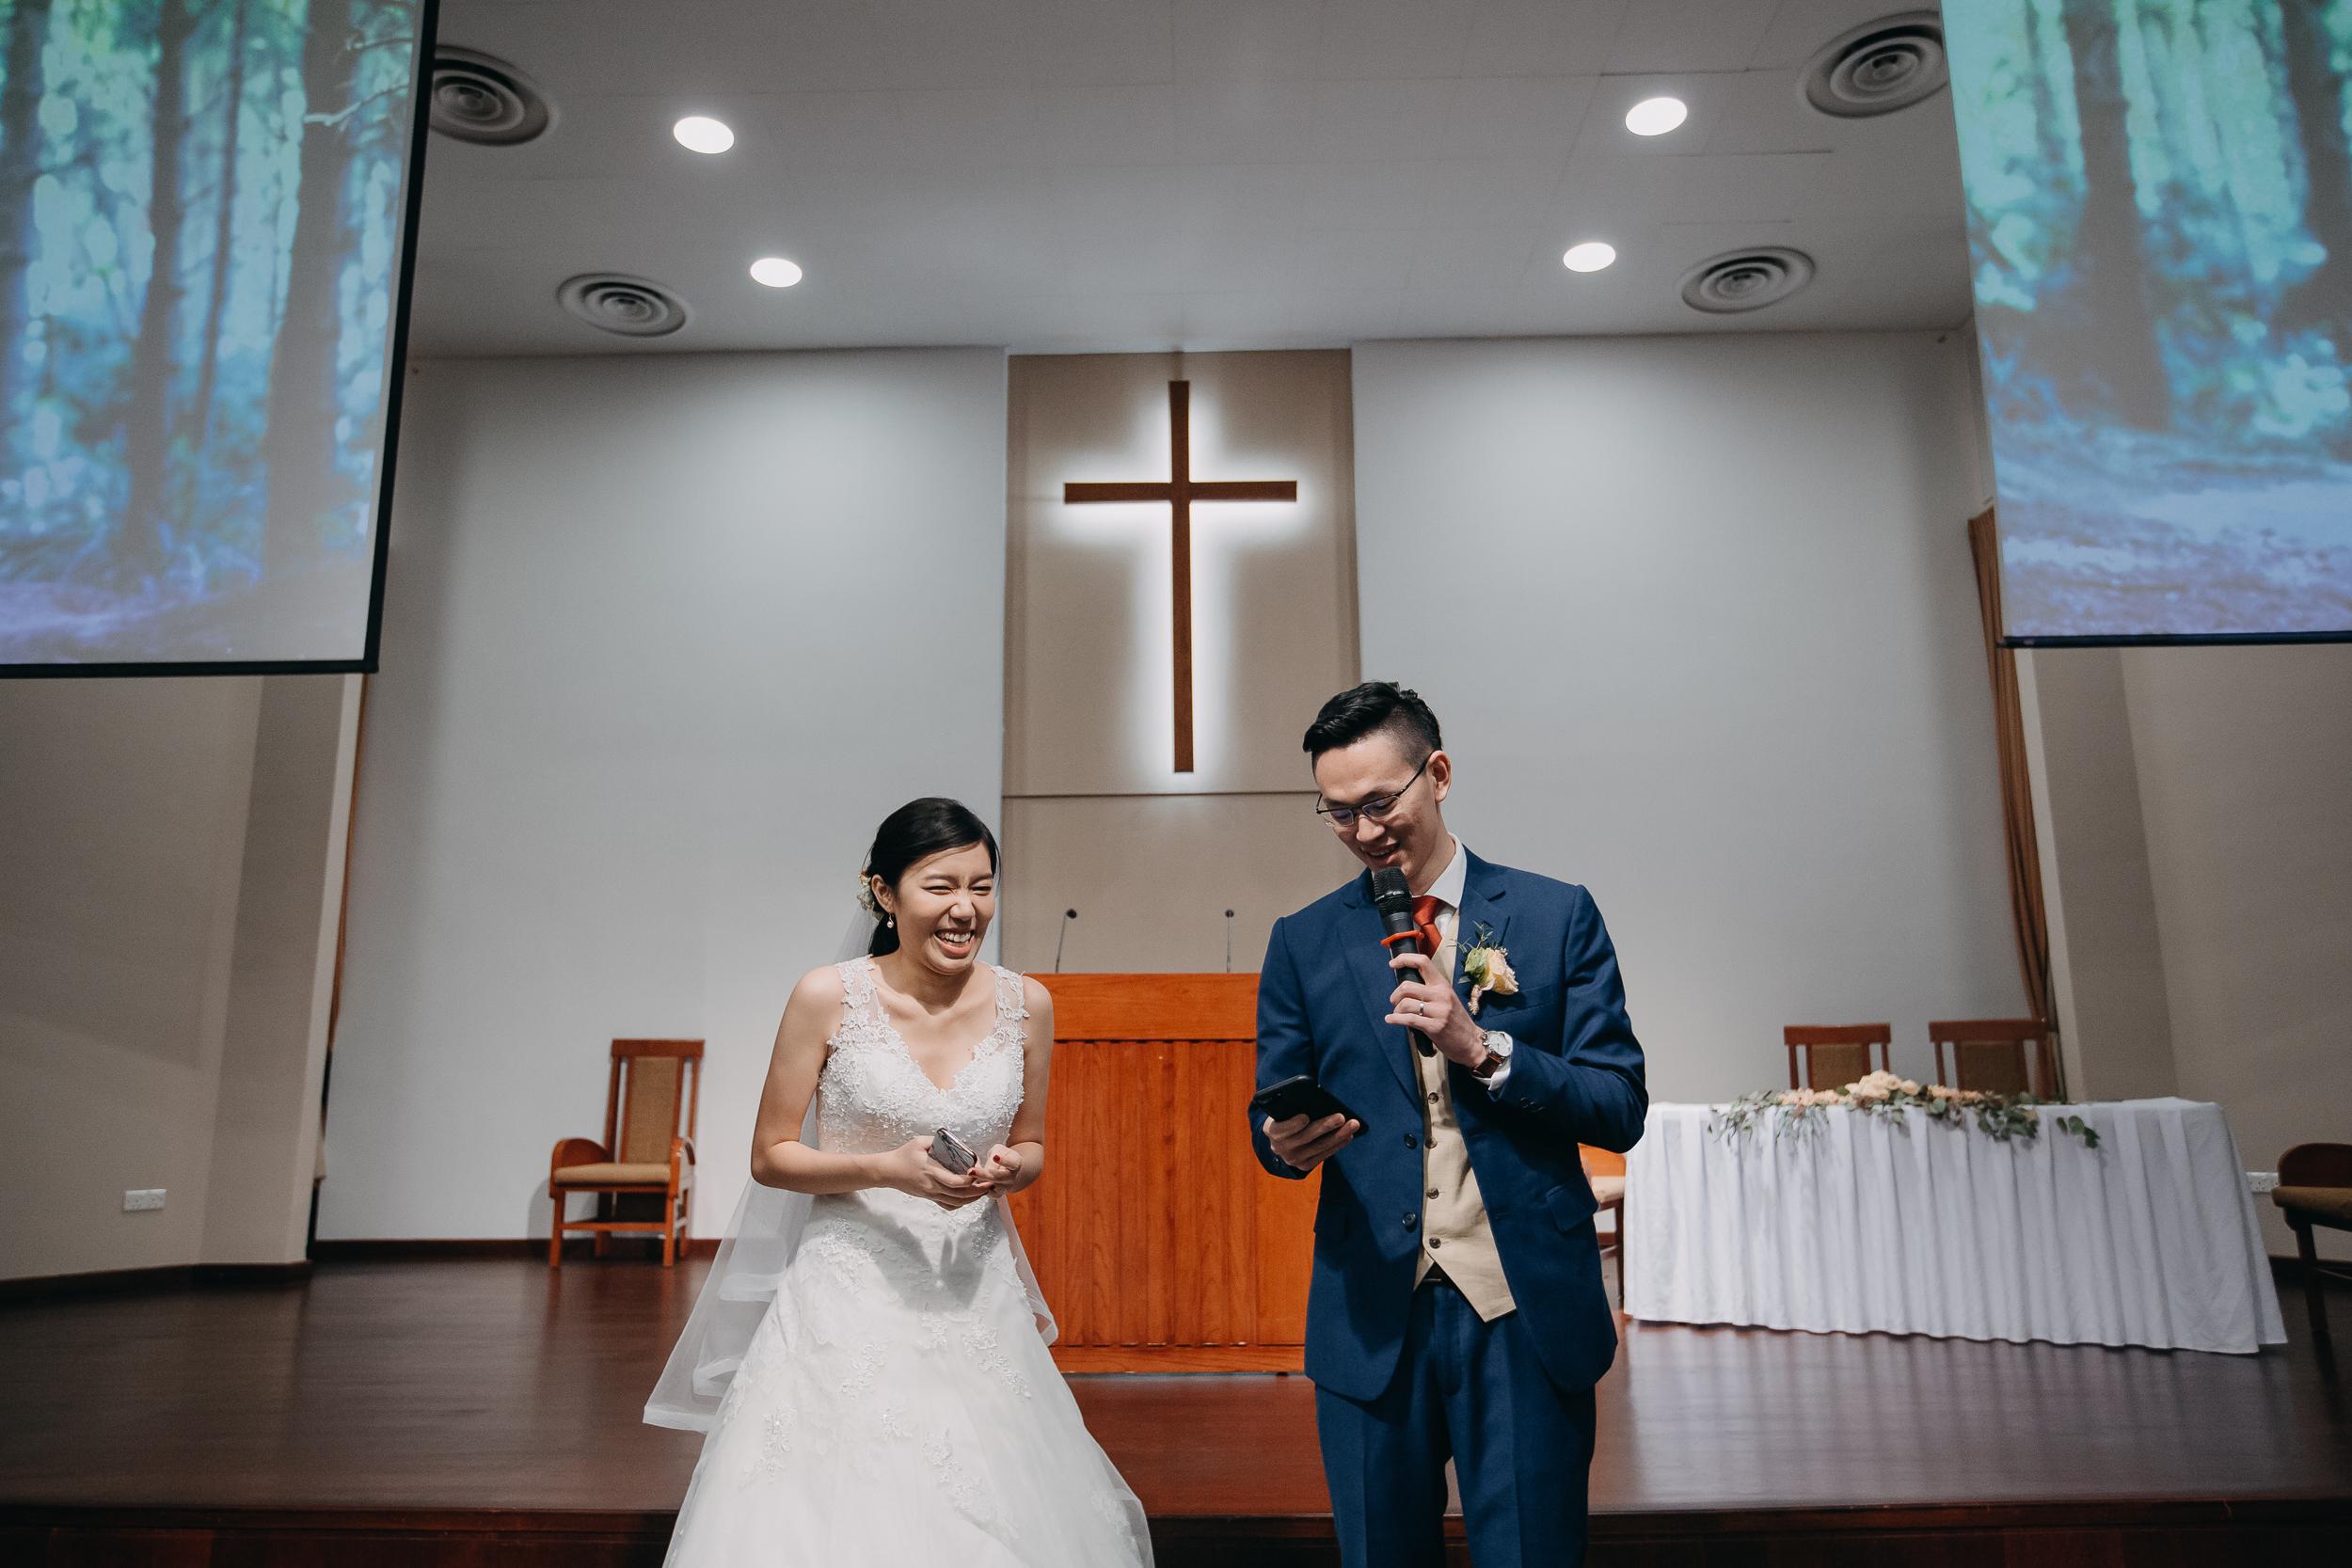 Singapore+Actual+Day+Wedding+Photographer+Min+Jiang+Rochester+Gareth+Faith--0041.jpg